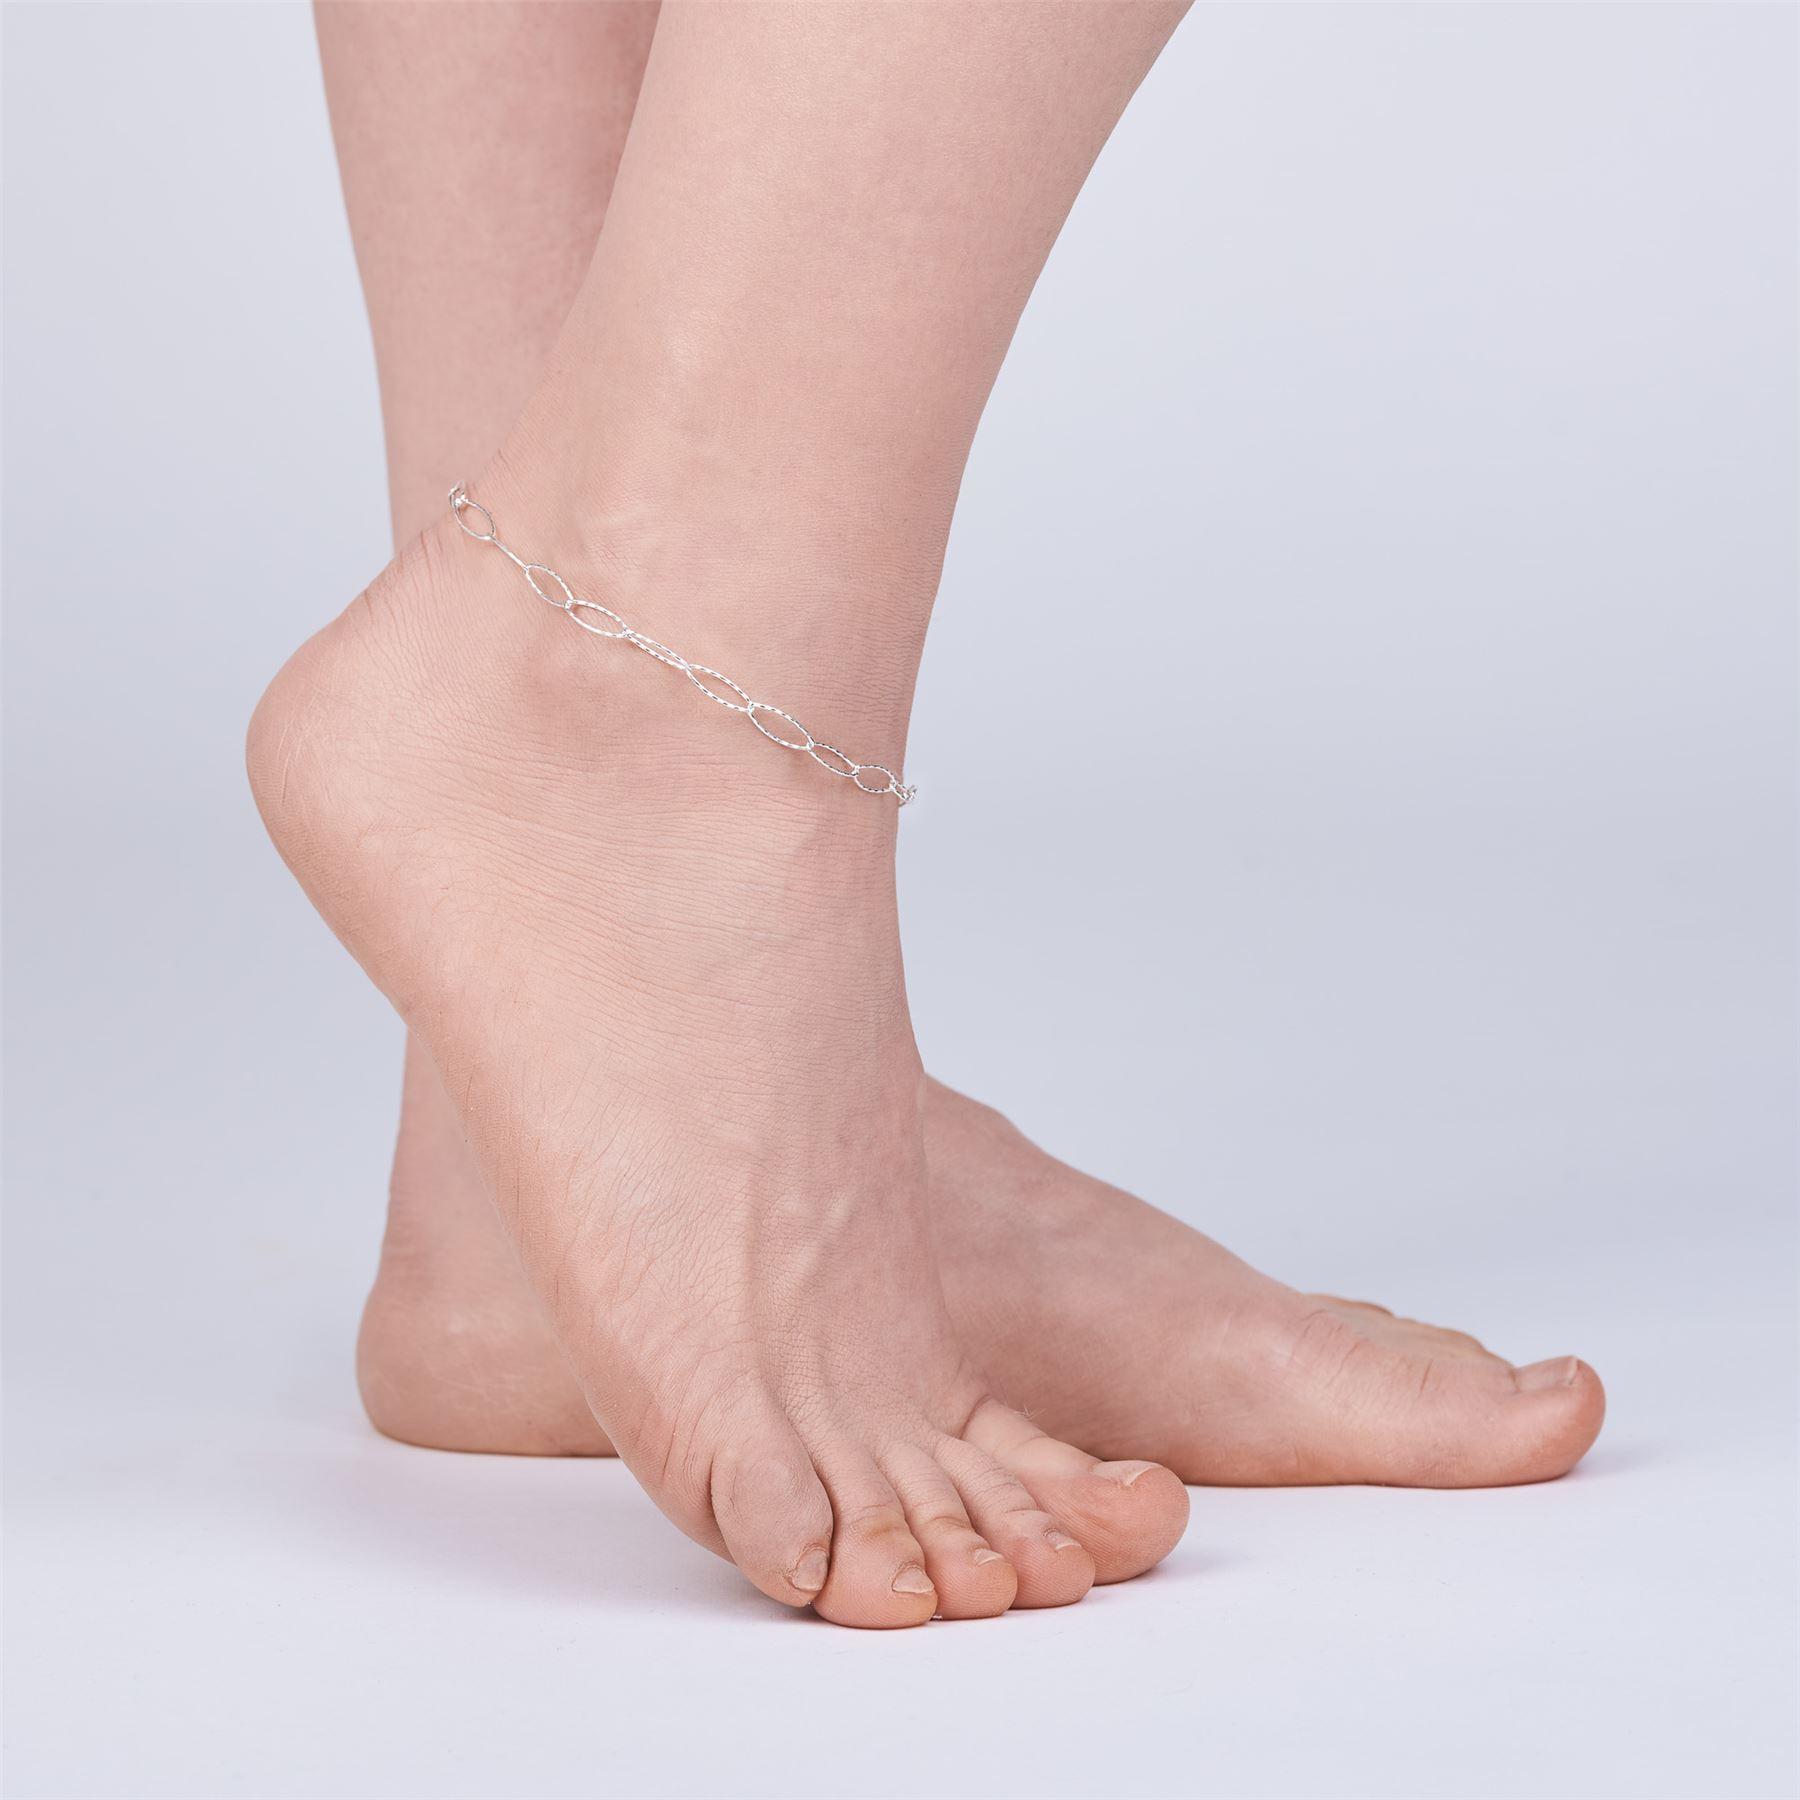 Amberta-Jewelry-925-Sterling-Silver-Adjustable-Anklet-Foot-Bracelet-for-Women miniature 54